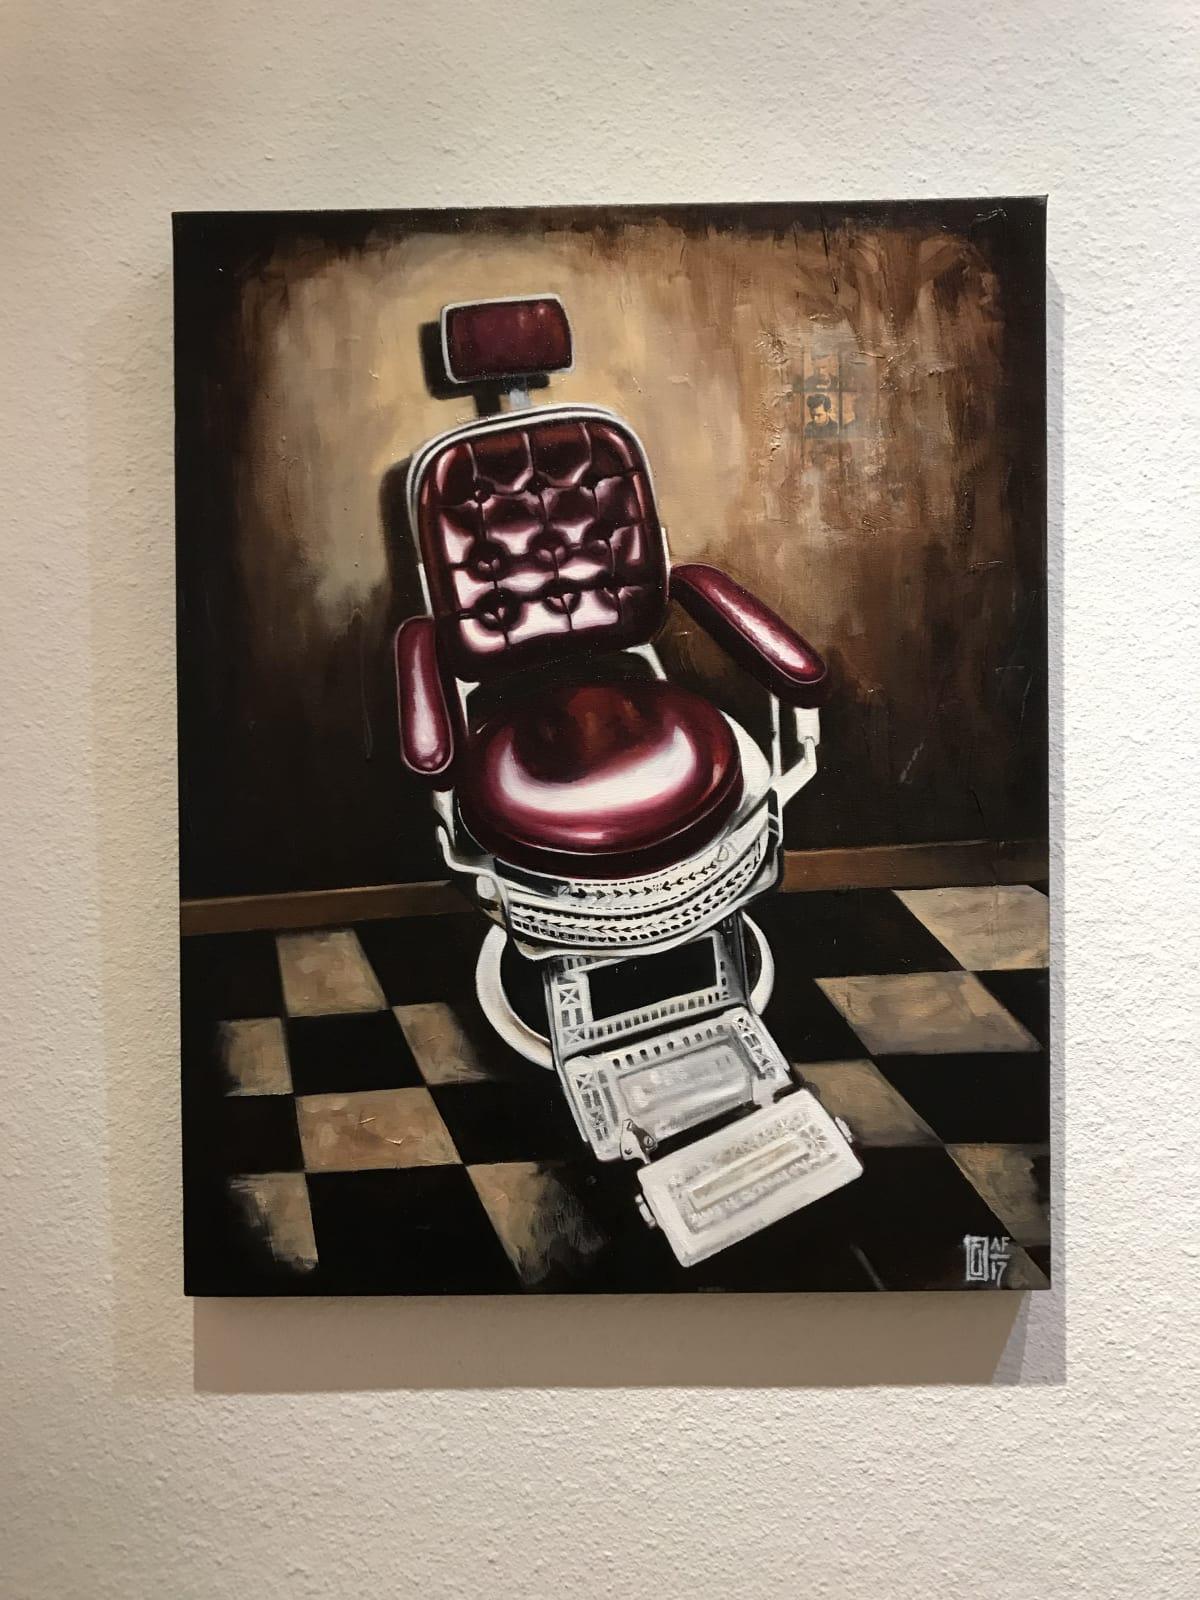 Curtis Gerhardt  Therapist Chair  Oil on Canvas  24 x 36